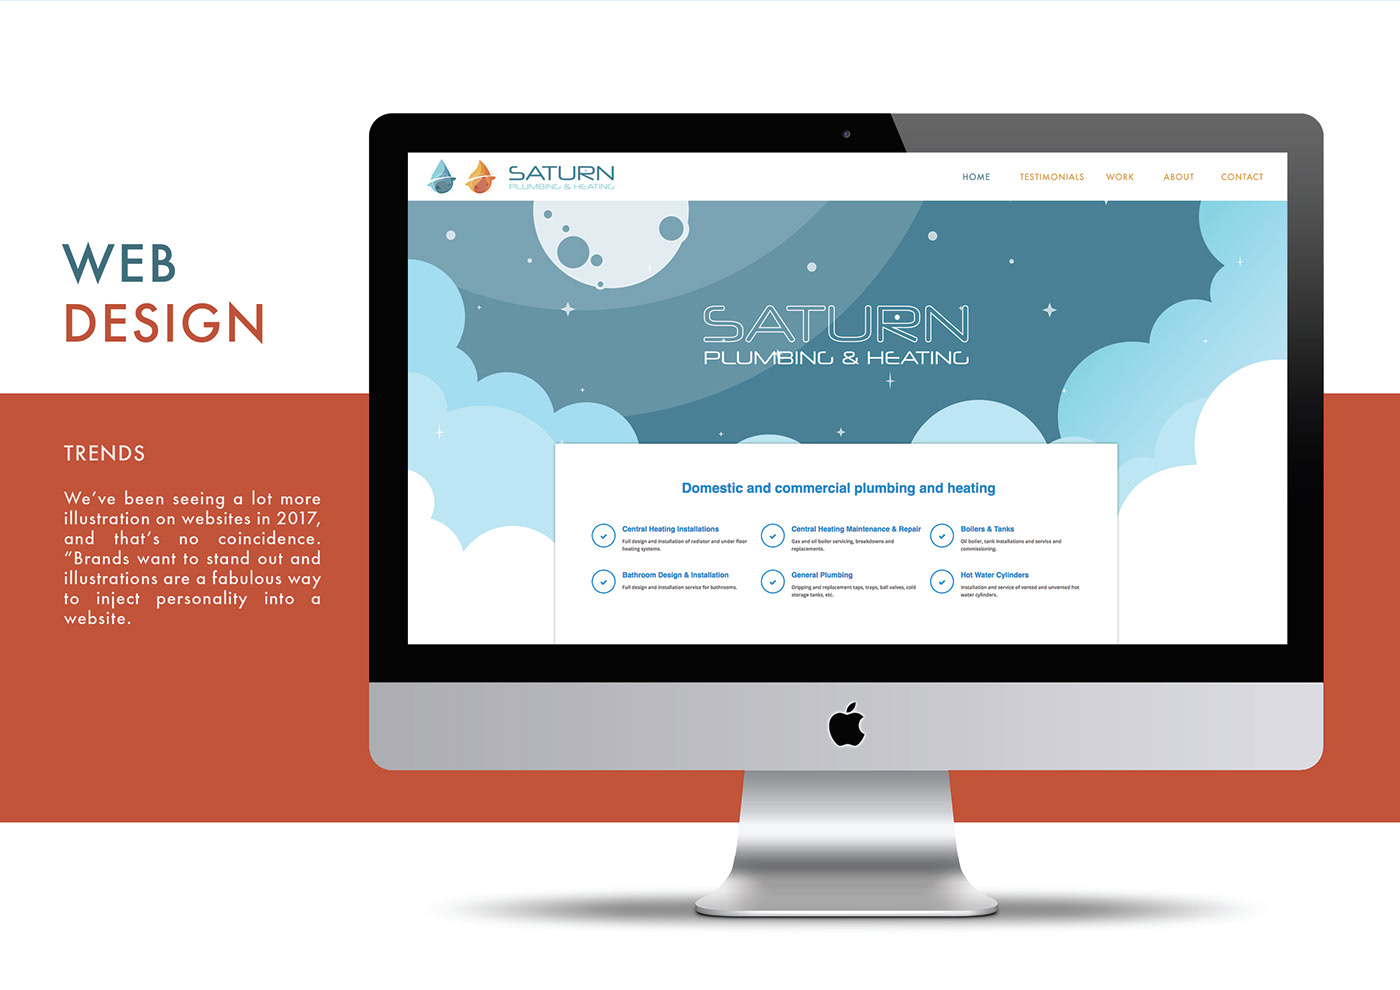 graphic design  branding  Branding design brand identity visual identity logomark Logo Design Business Design design concept Branding Concept Rebrand logo rebrand Business Rebrand Web Design  app design